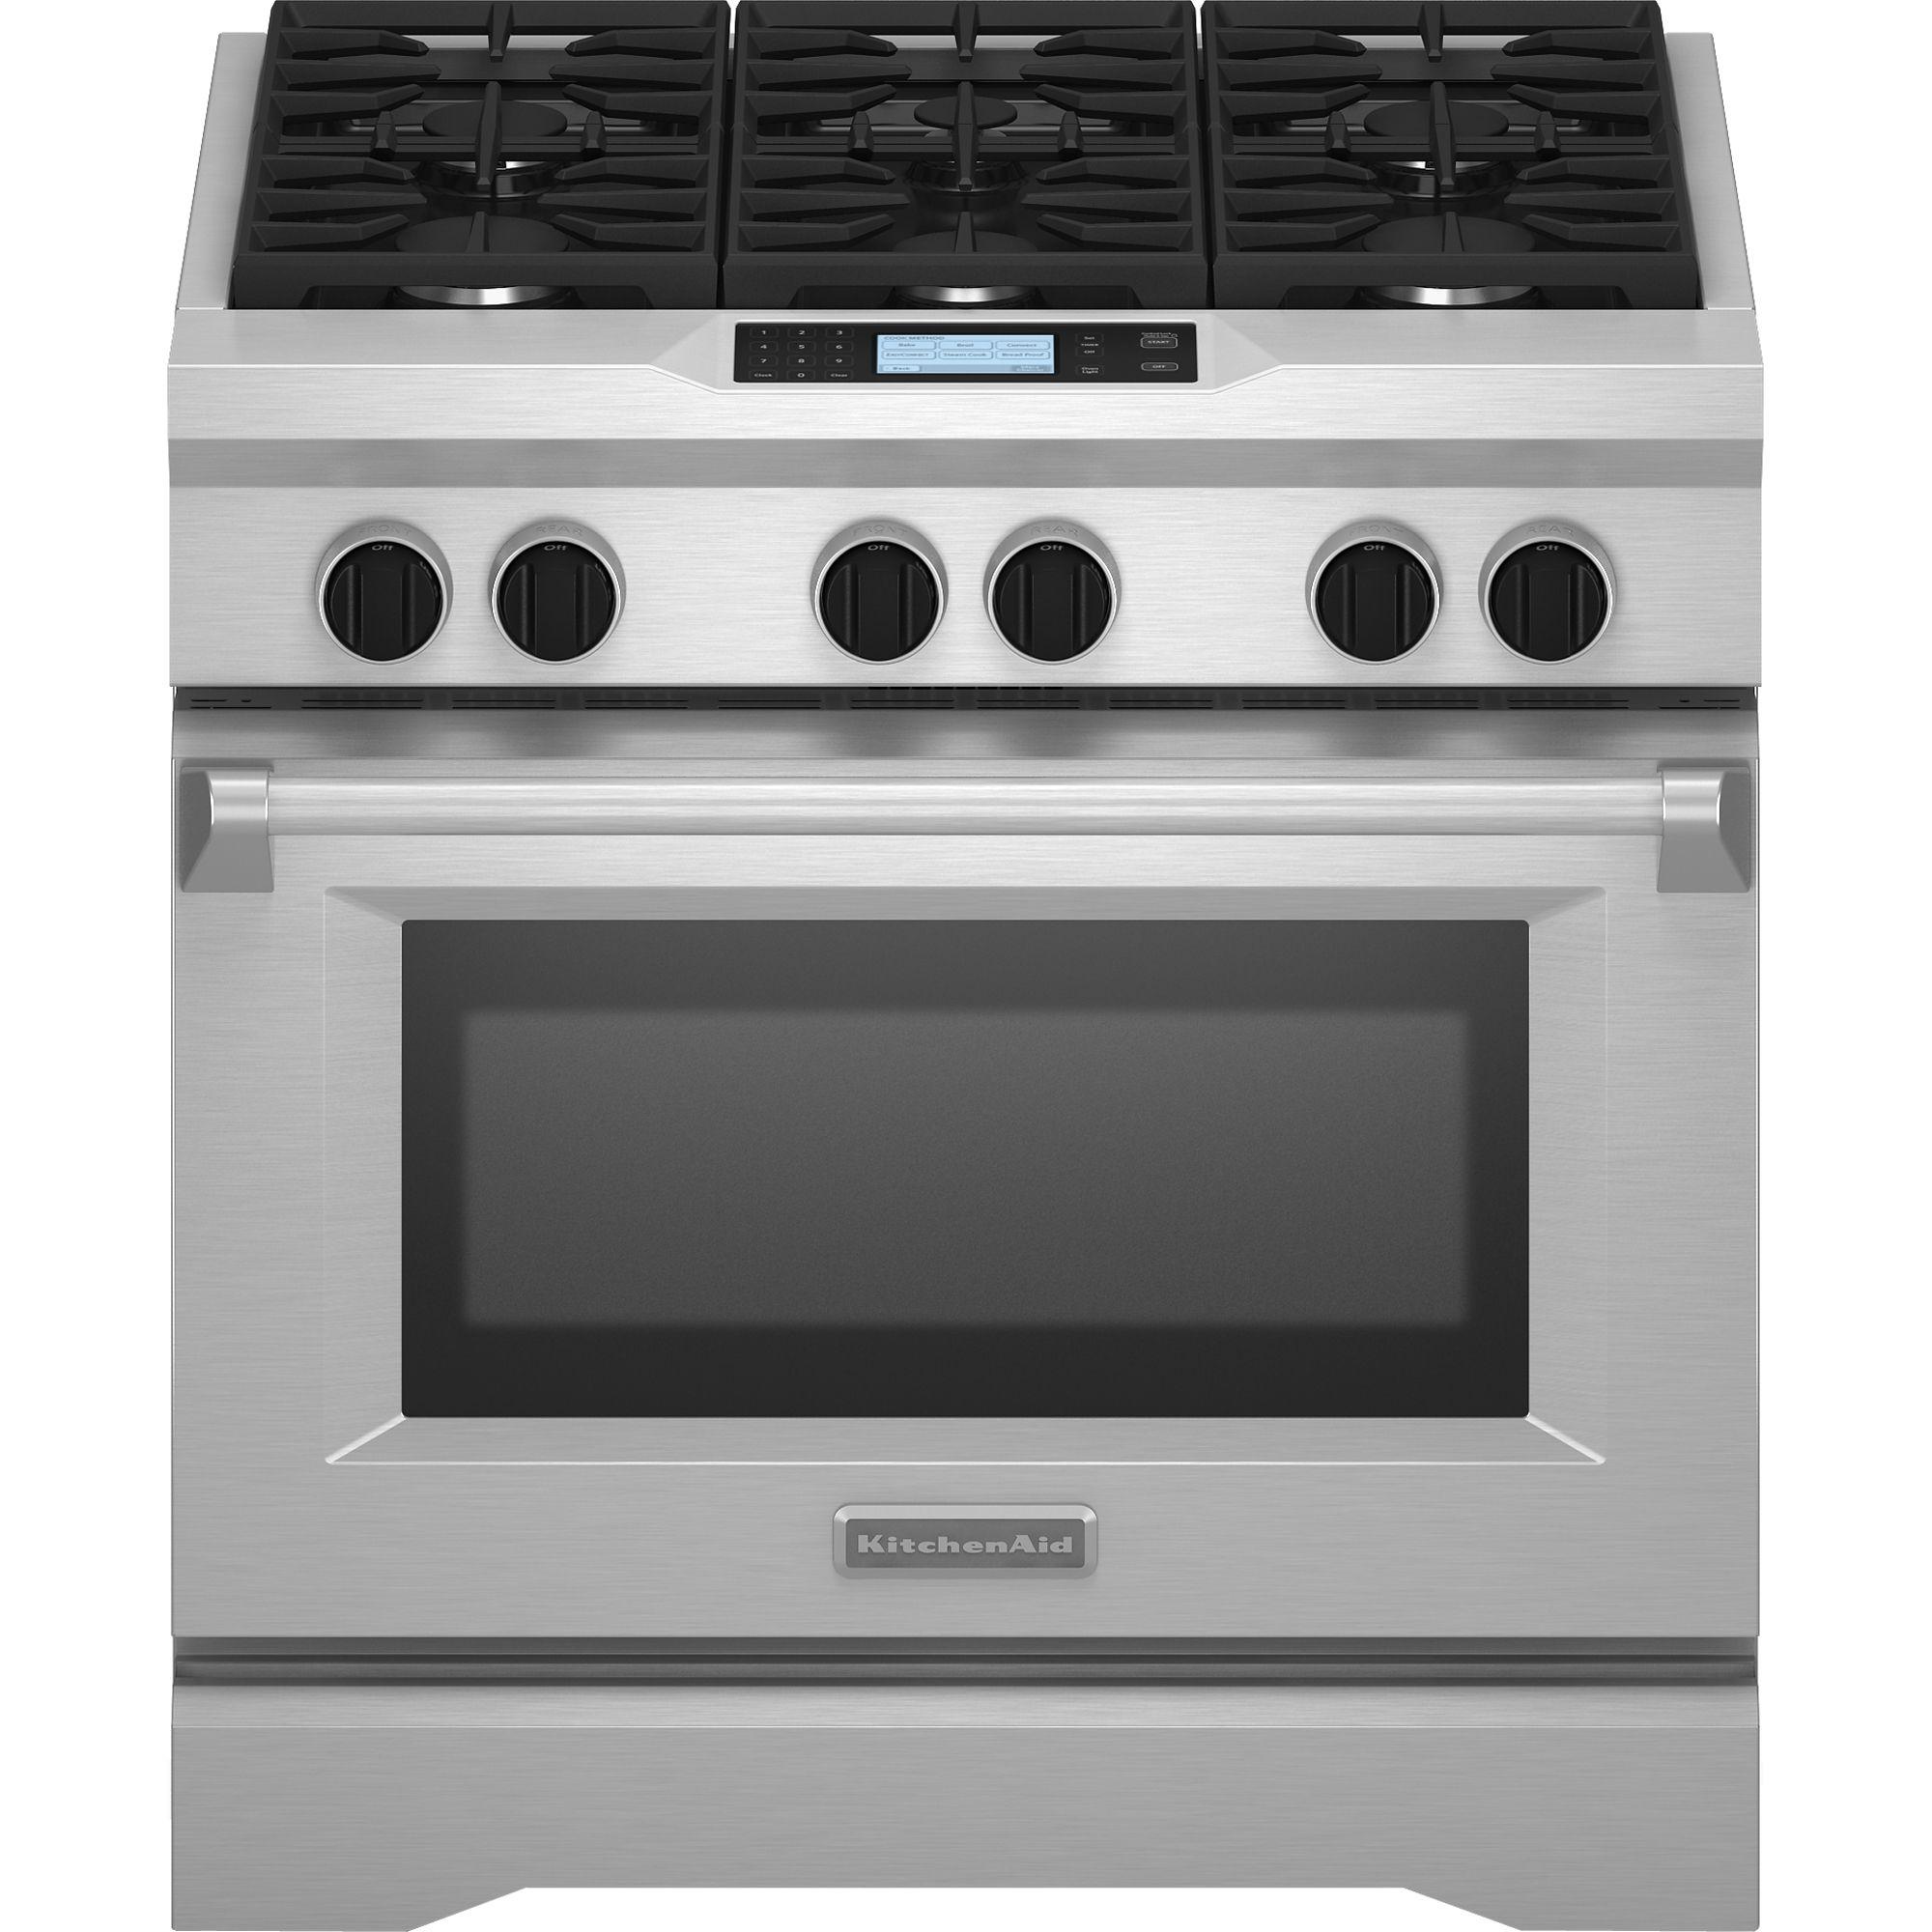 KitchenAid KDRU767VSS Pro-Style® 5.1 cu. ft. Dual Fuel Range - Stainless Steel